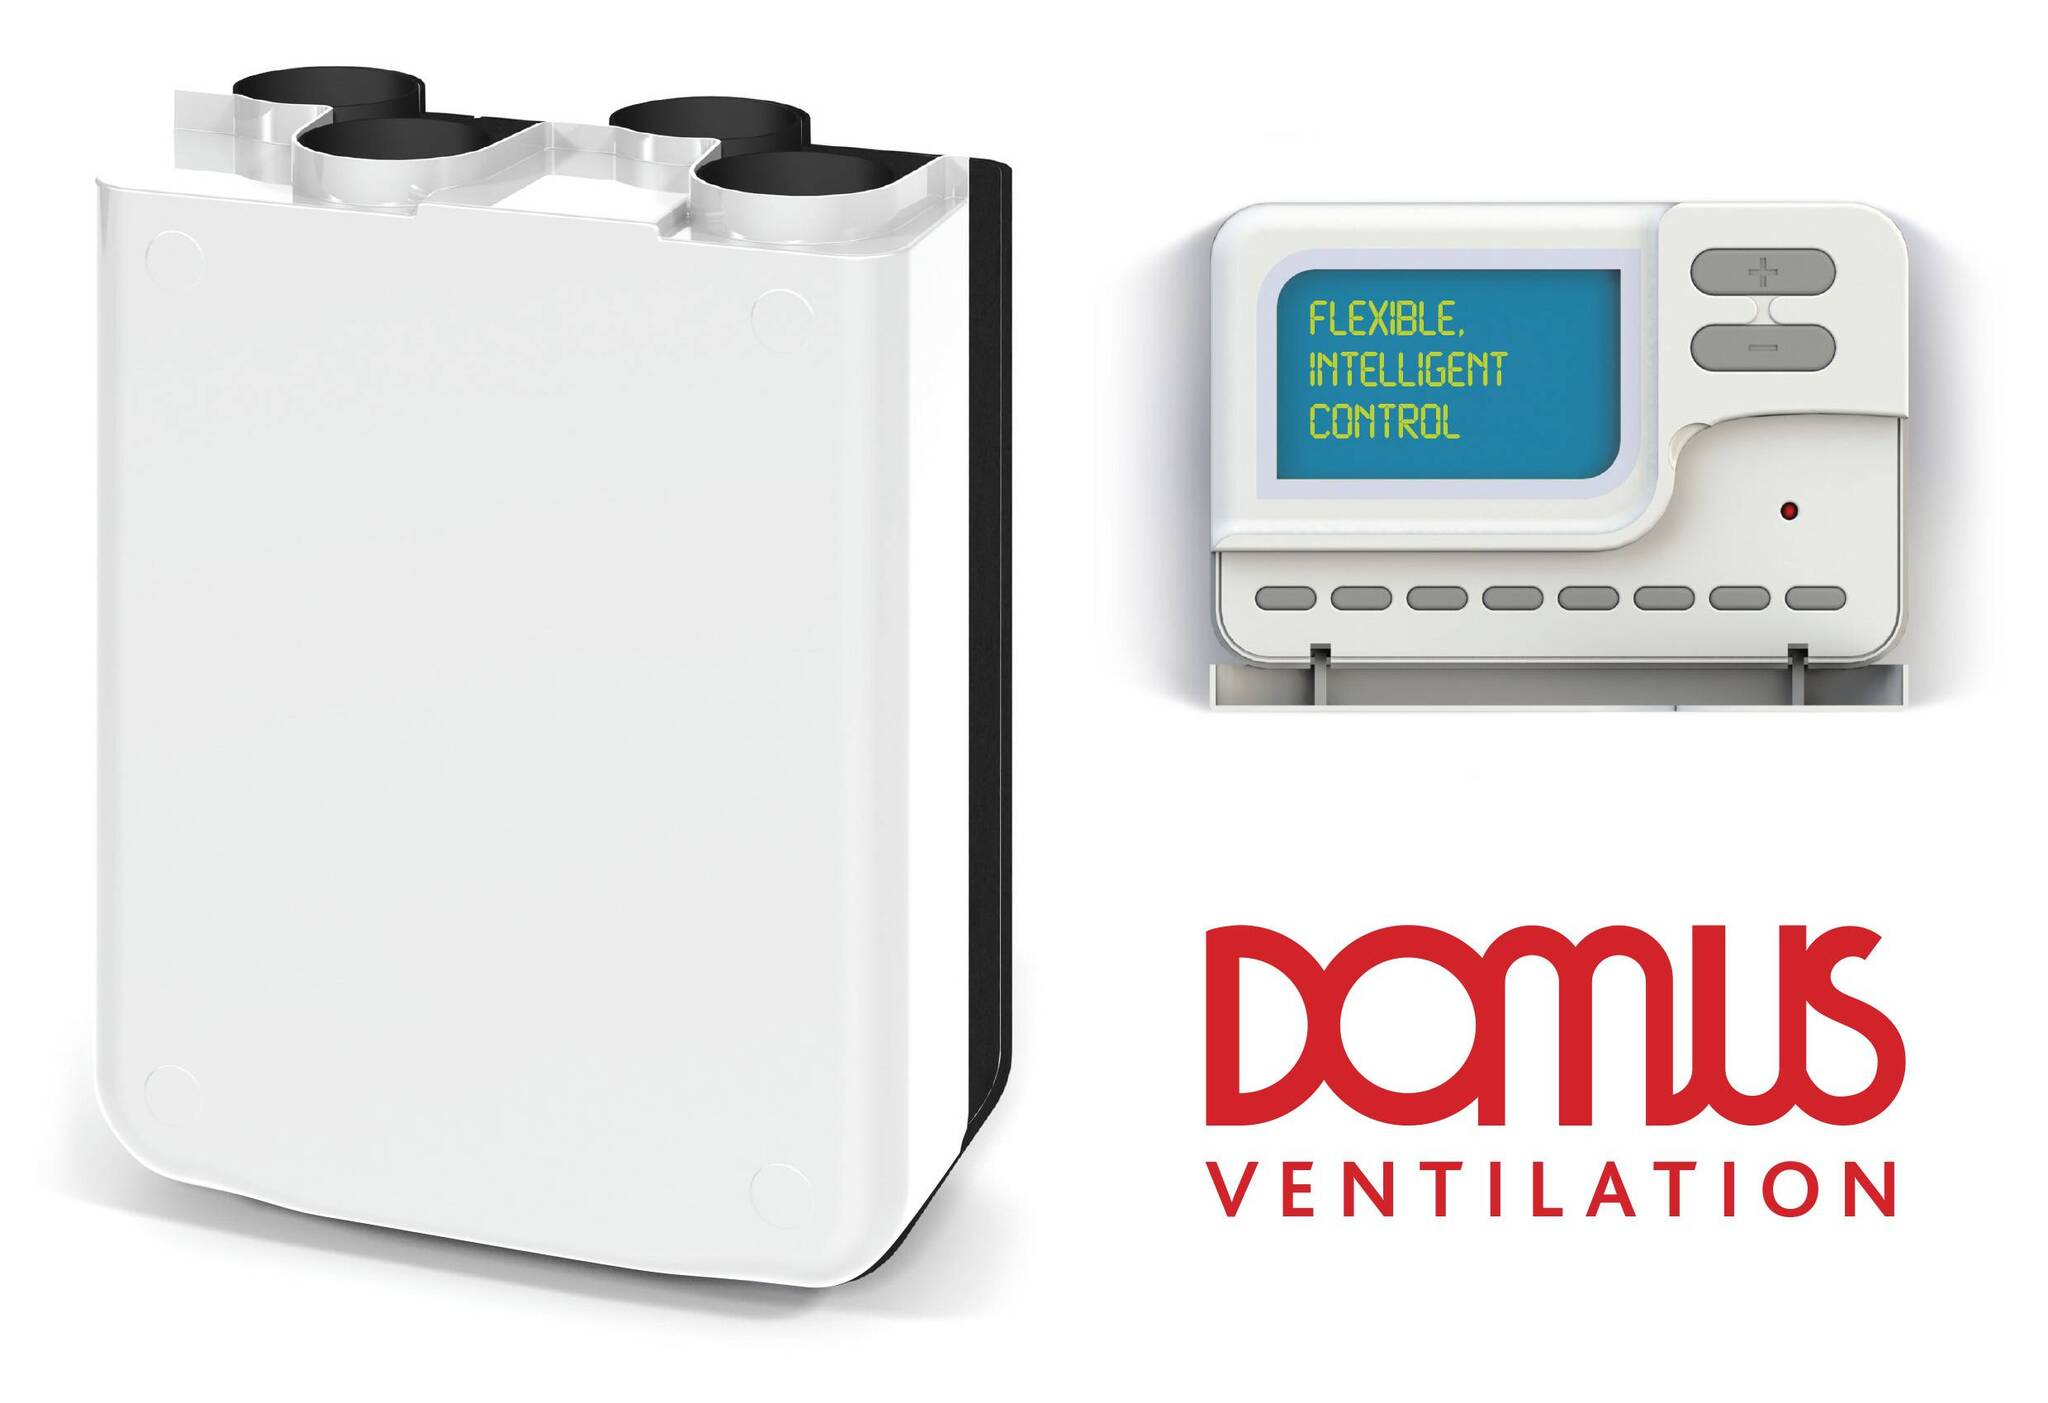 Domus Ventilation Mvhr Wall Units Now With Bluebrain Control